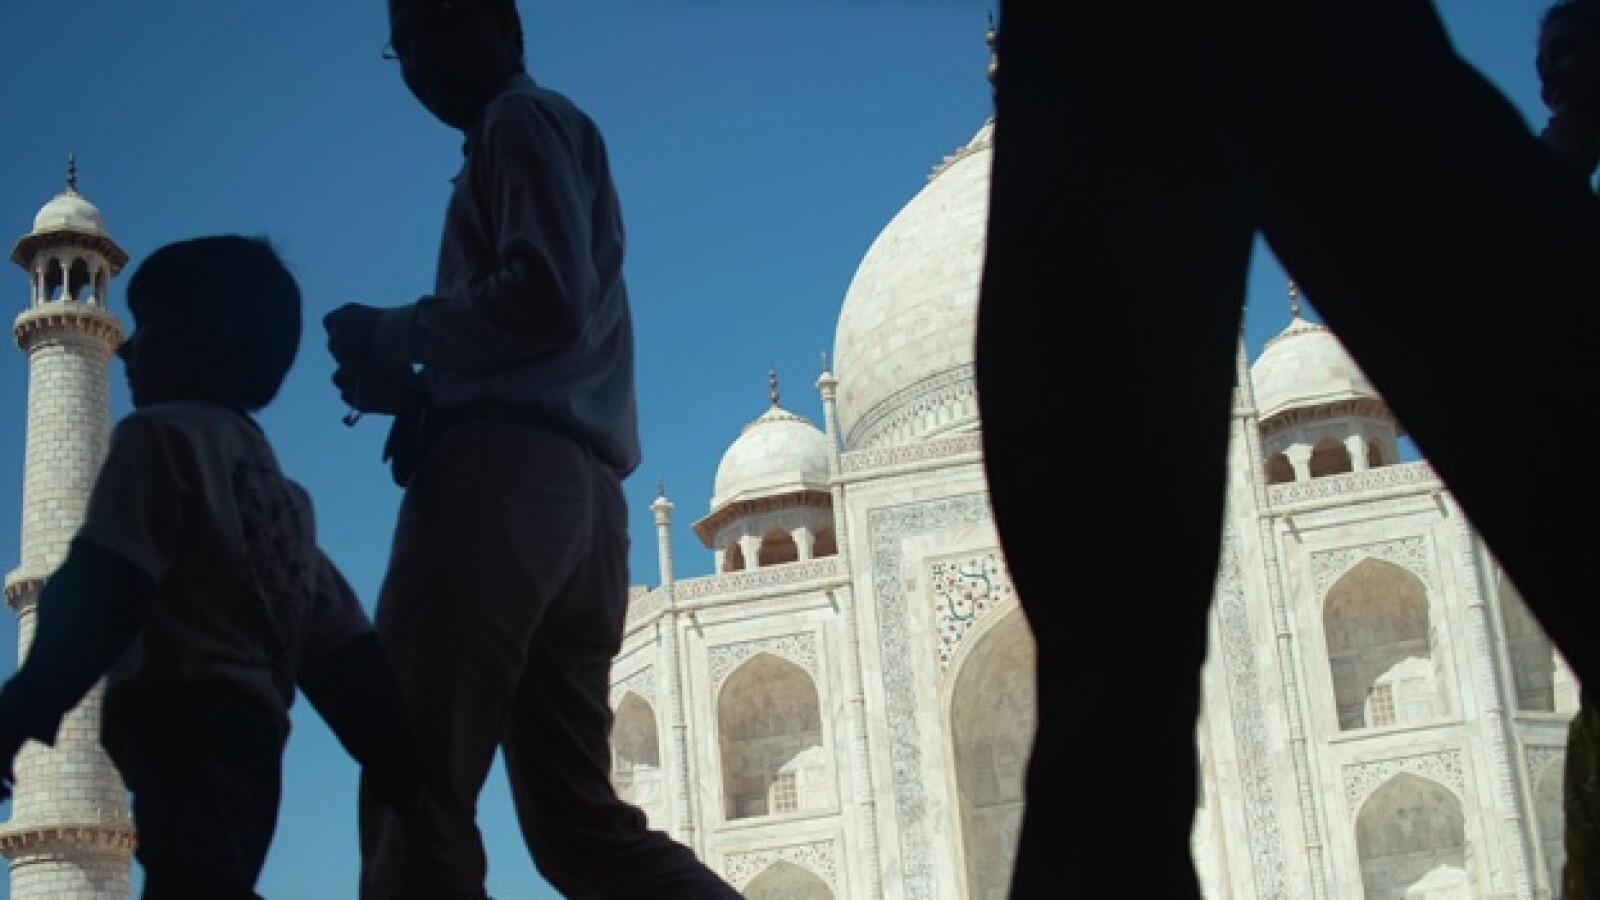 india agra Julie Mayfeng fotógrafa de viajes monocle, fotografia, viaje, foto